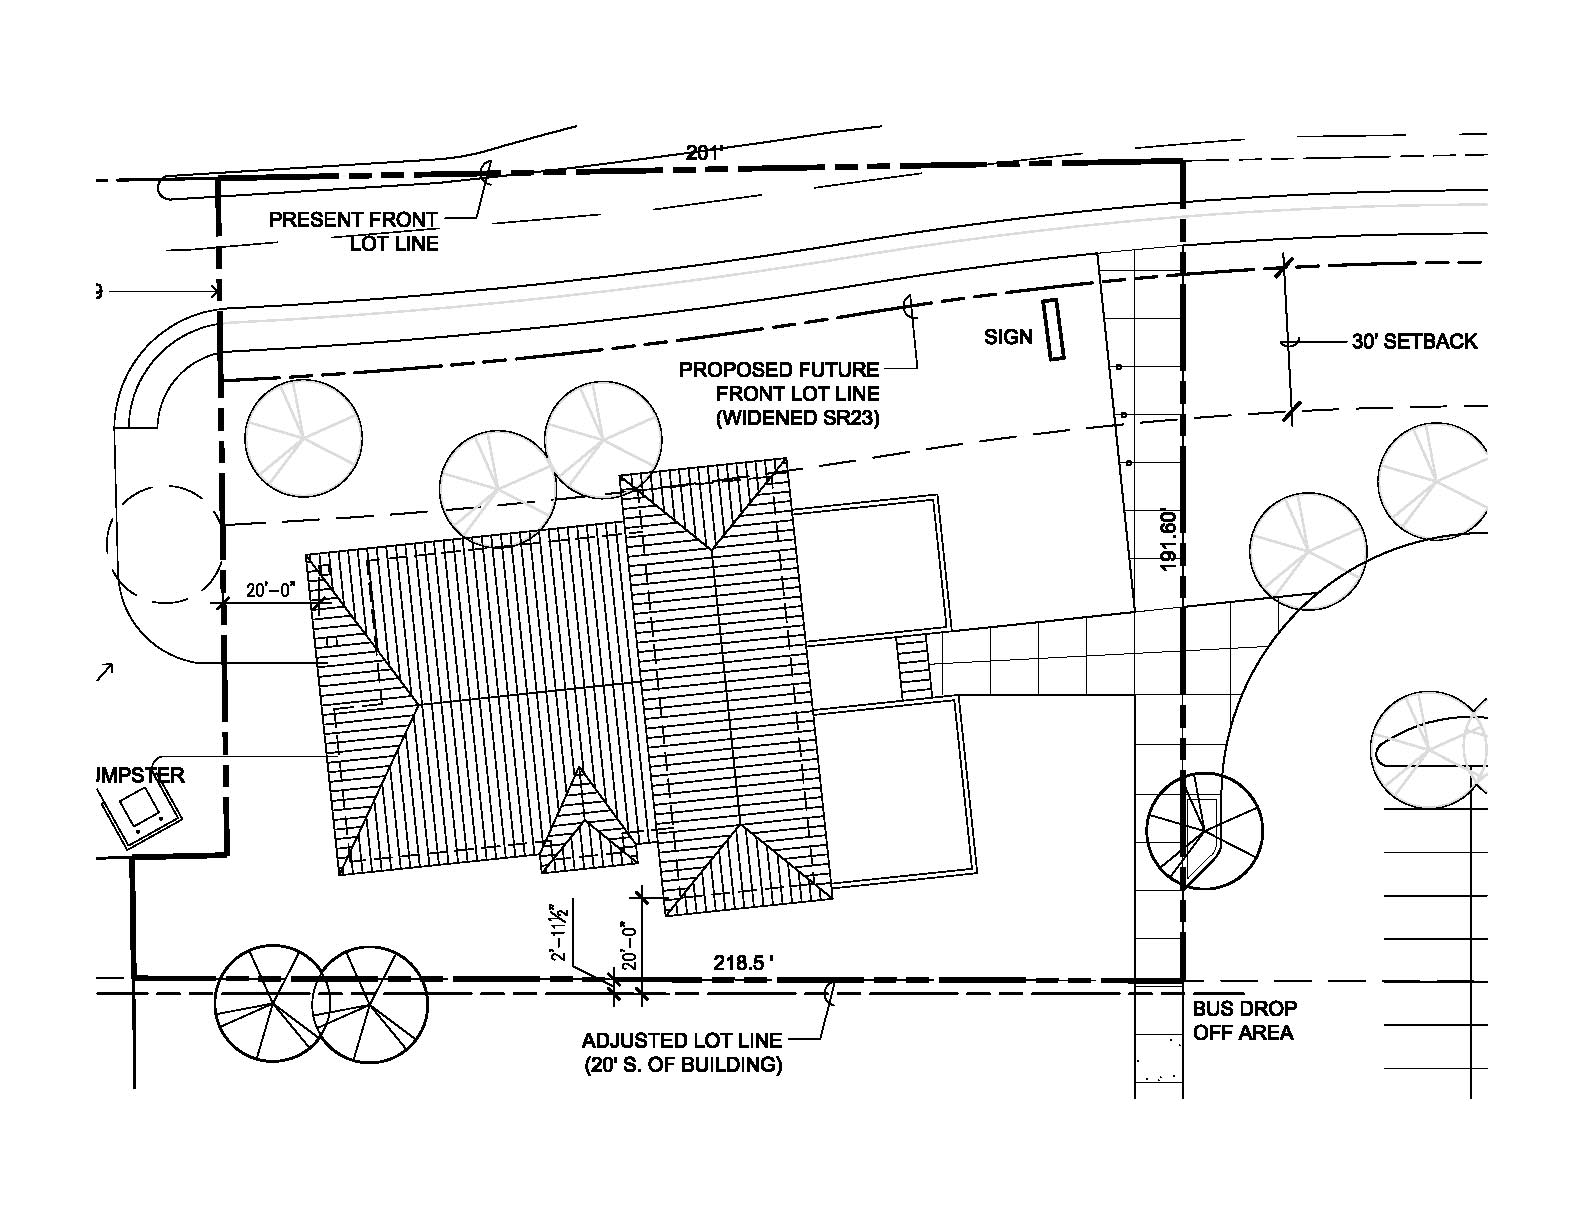 KeralaArchitect.com: Preparing Your Site For Construction